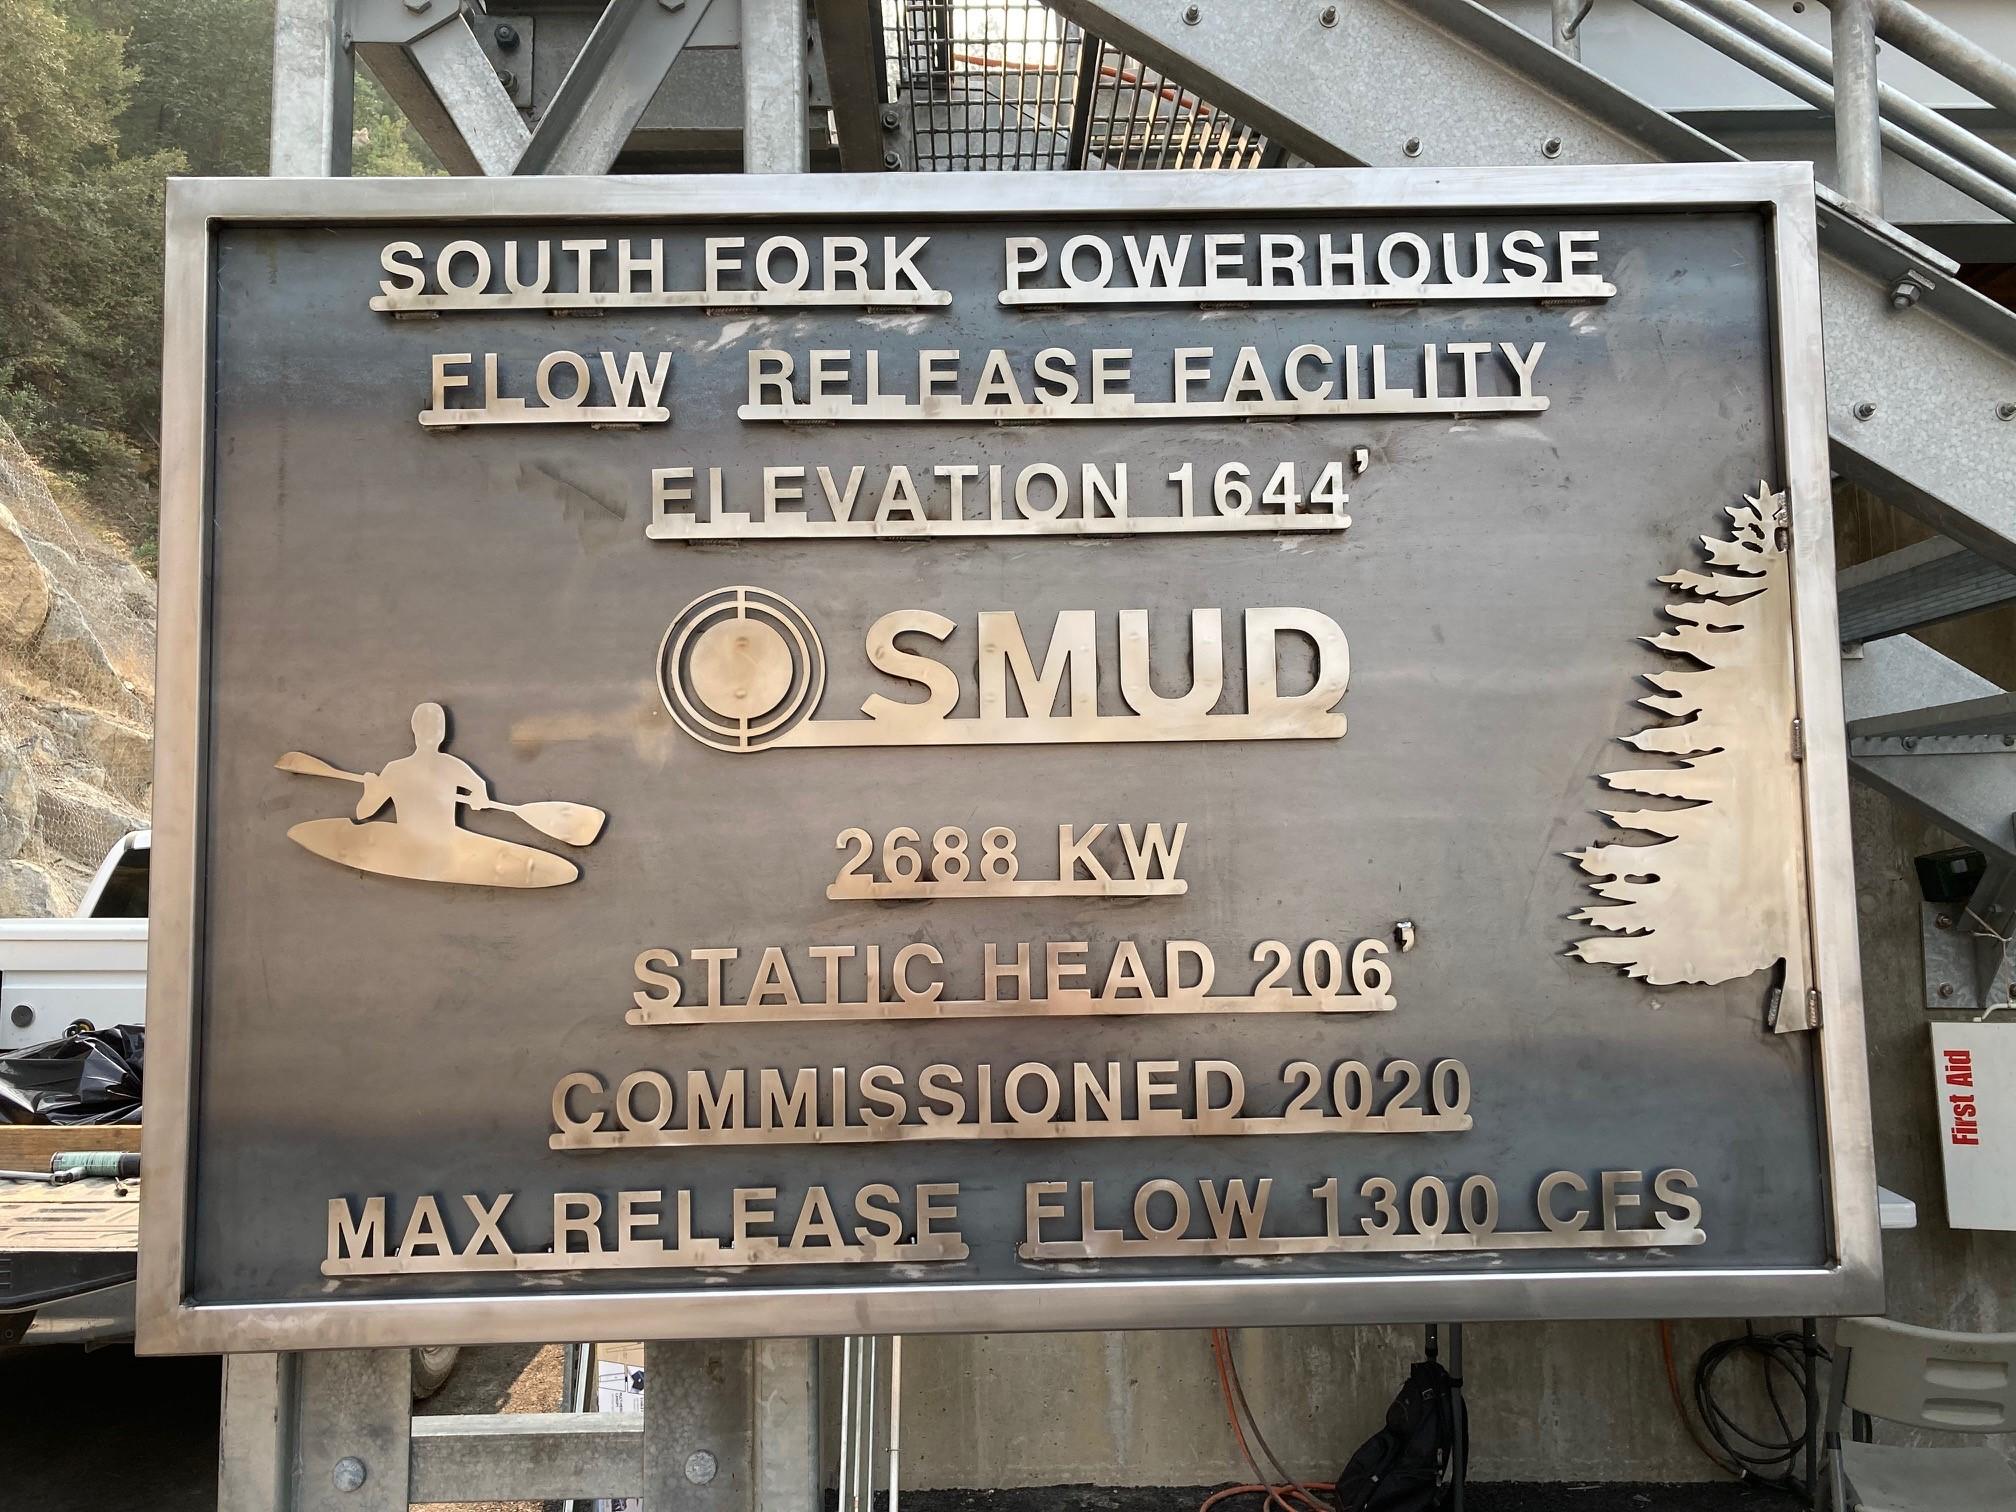 South Fork Powerhouse